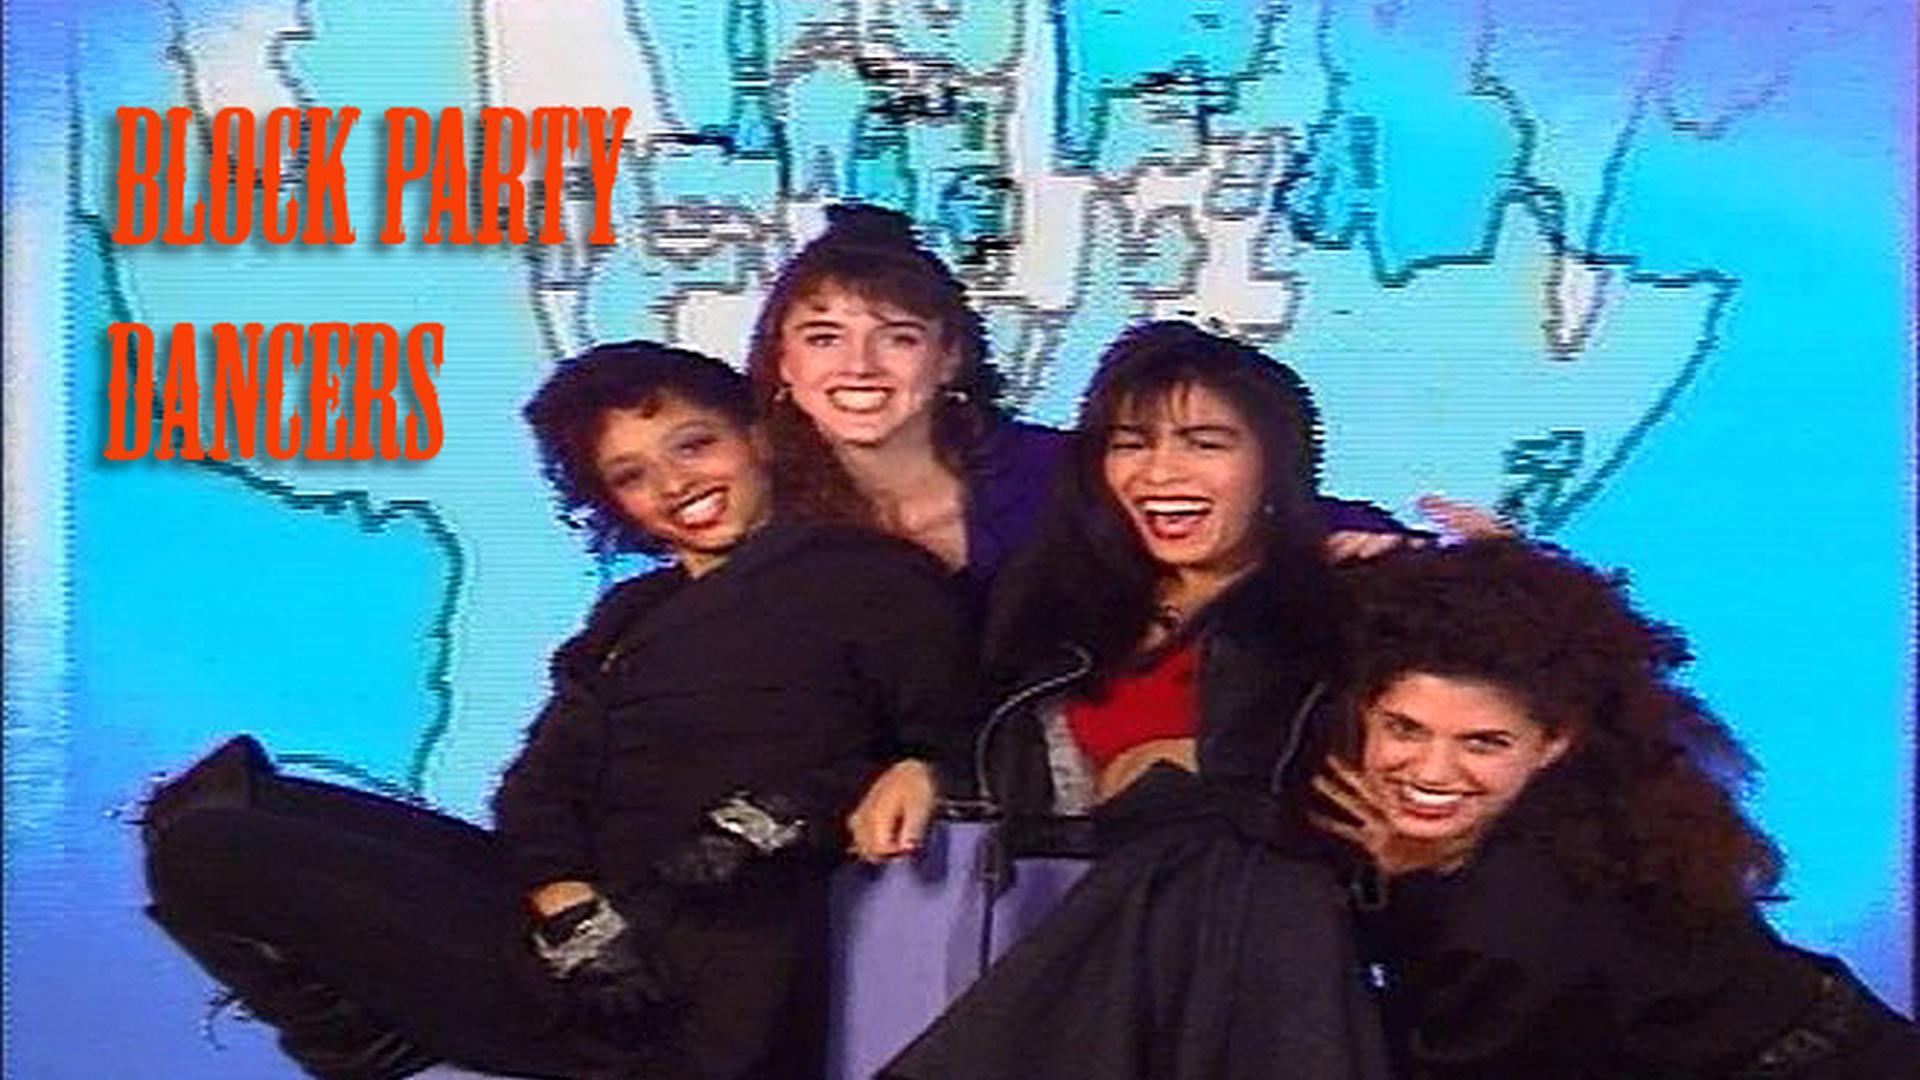 BLOCK PARTY - HD Remix (1990)